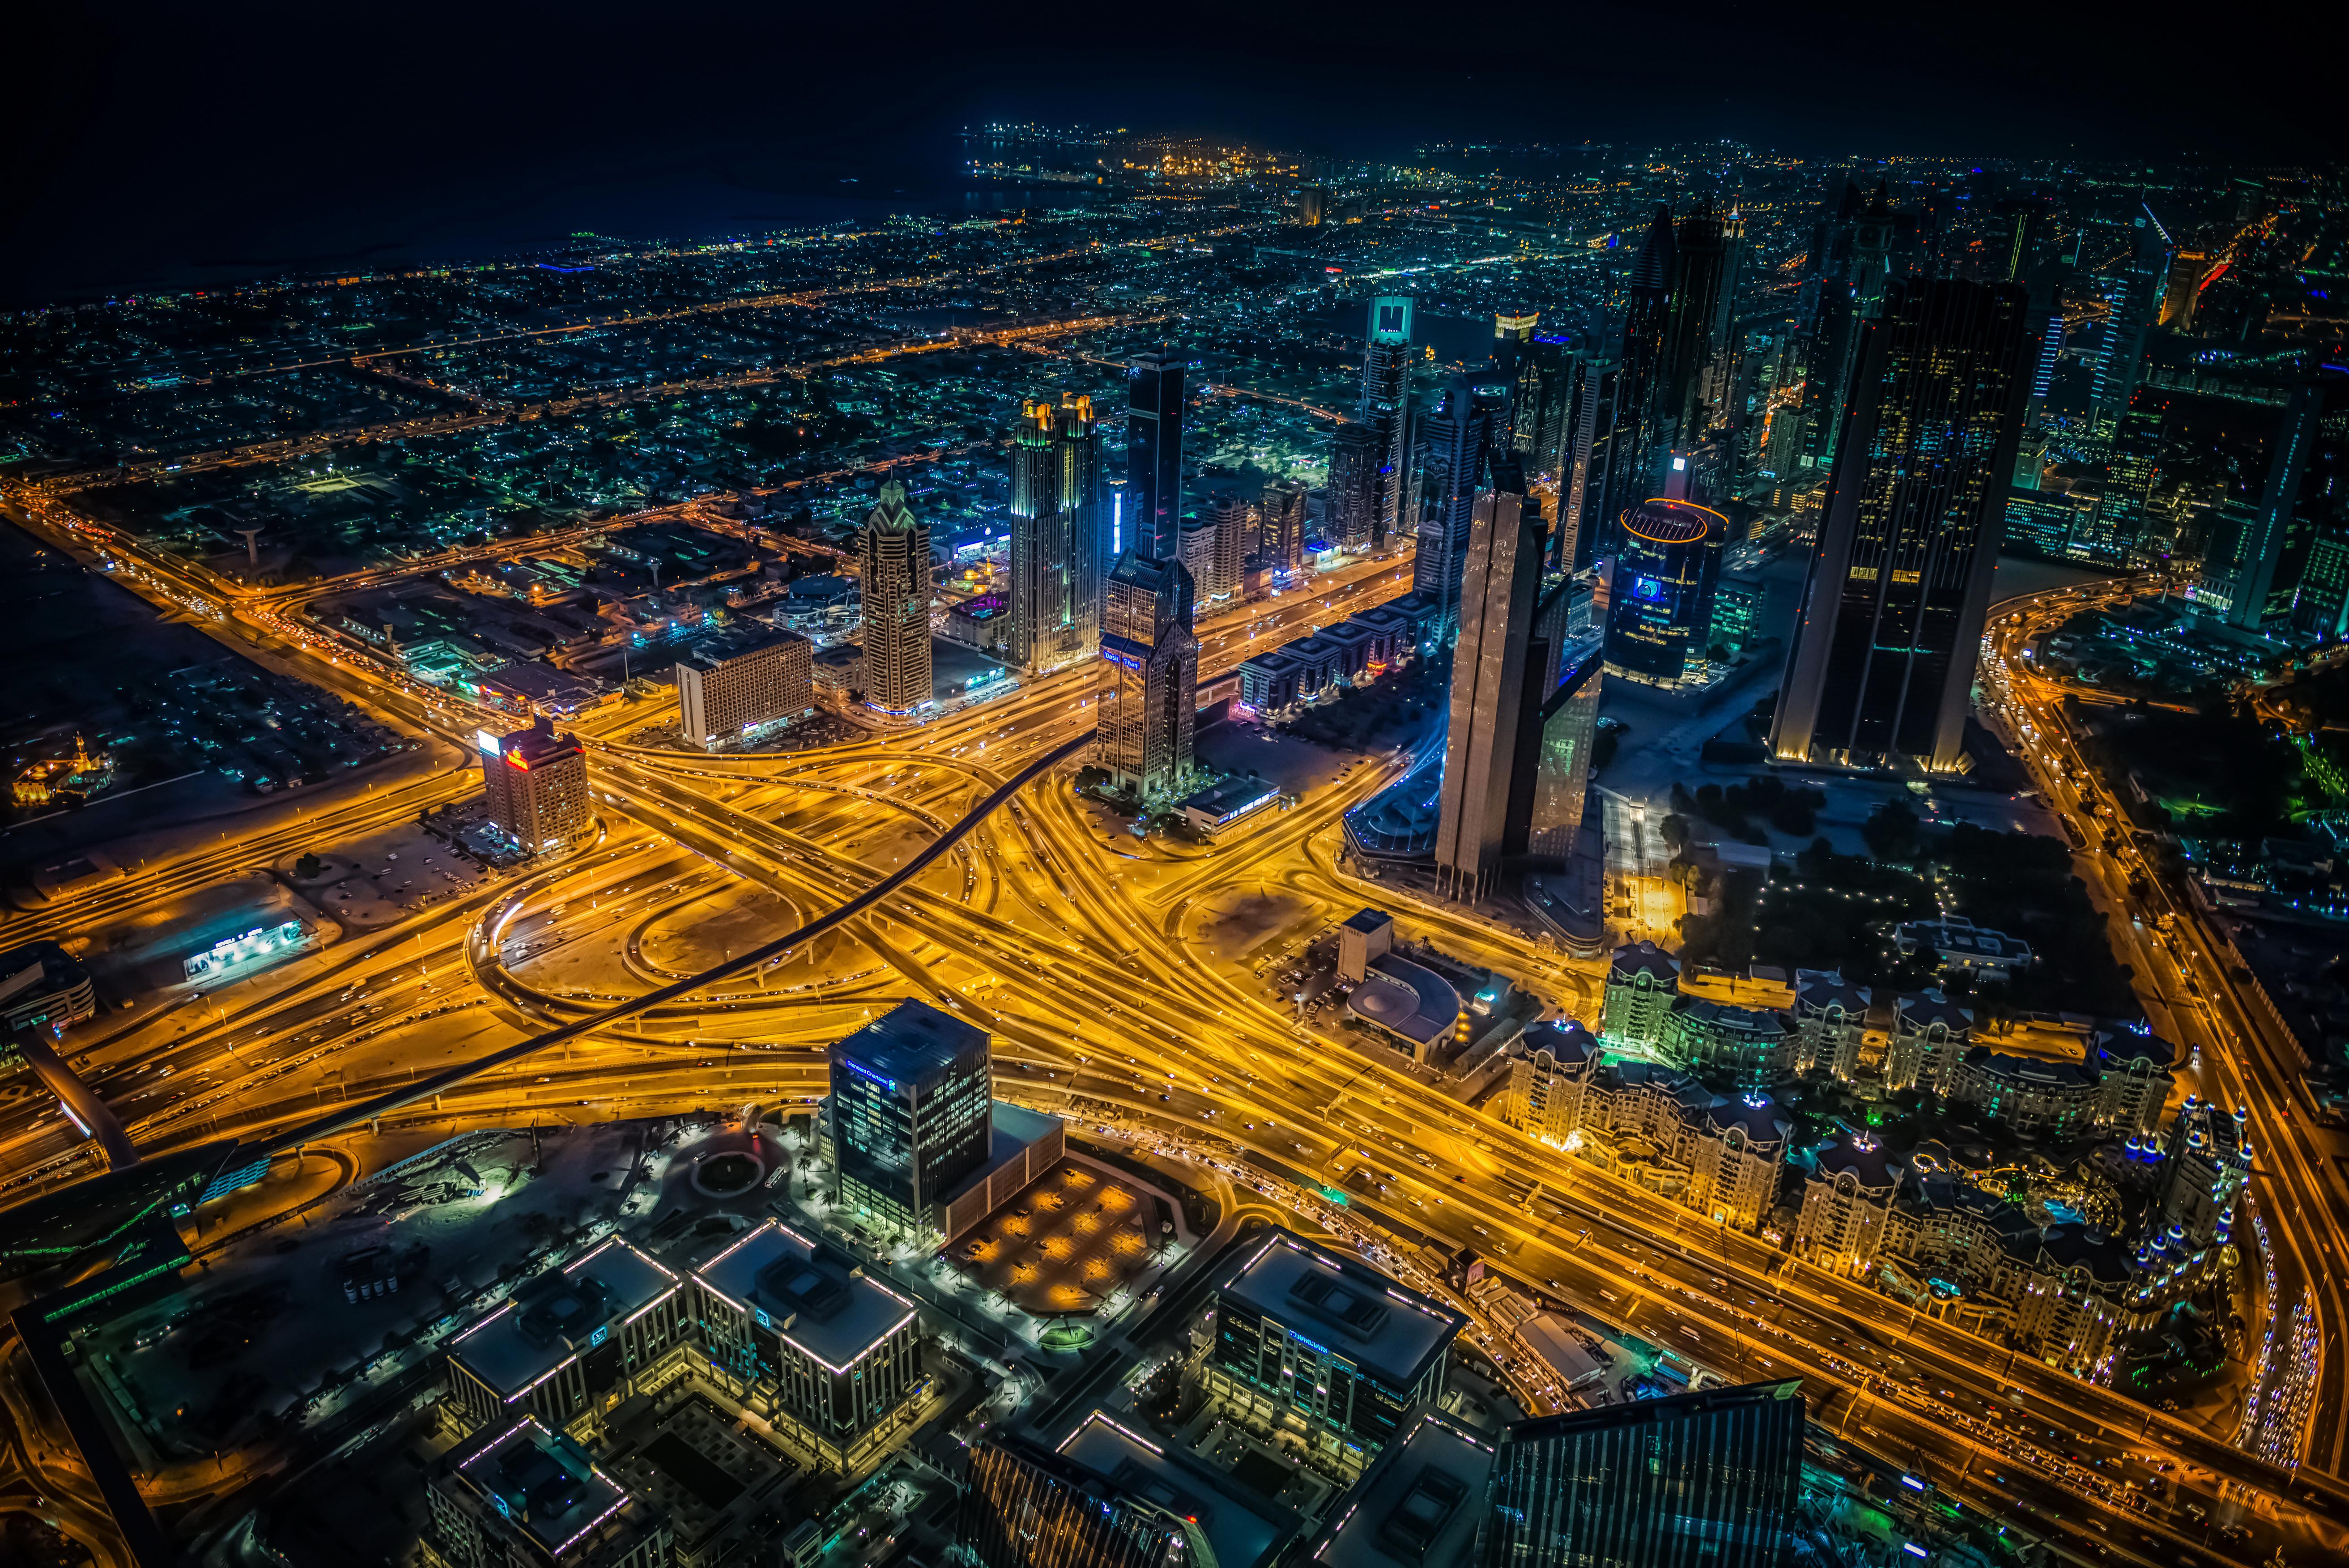 Dubai 4k Wallpaper: Dubai Building Lights Skycrappers 4k, HD World, 4k